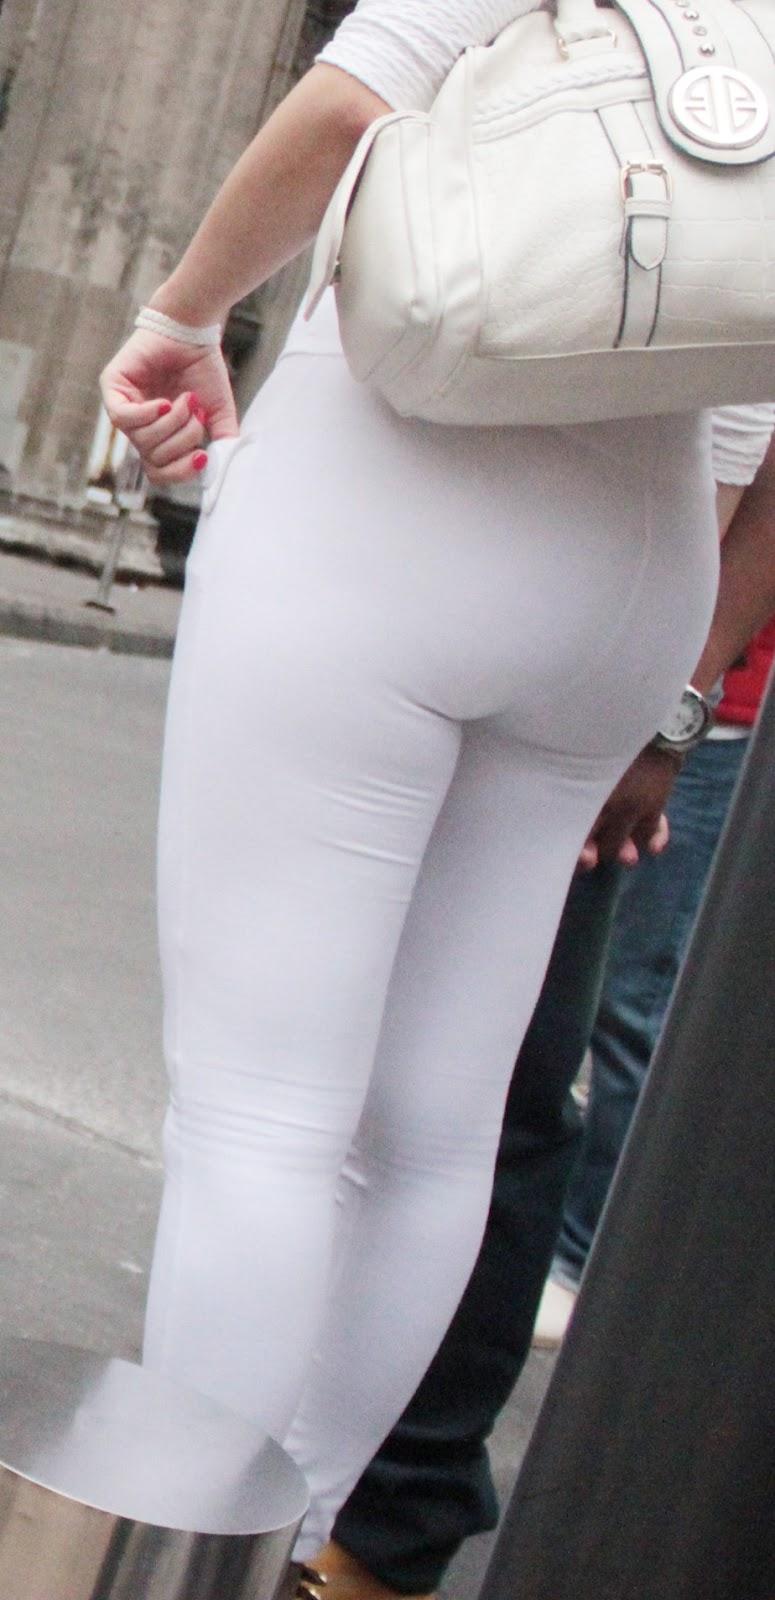 Milf en pantos blancos